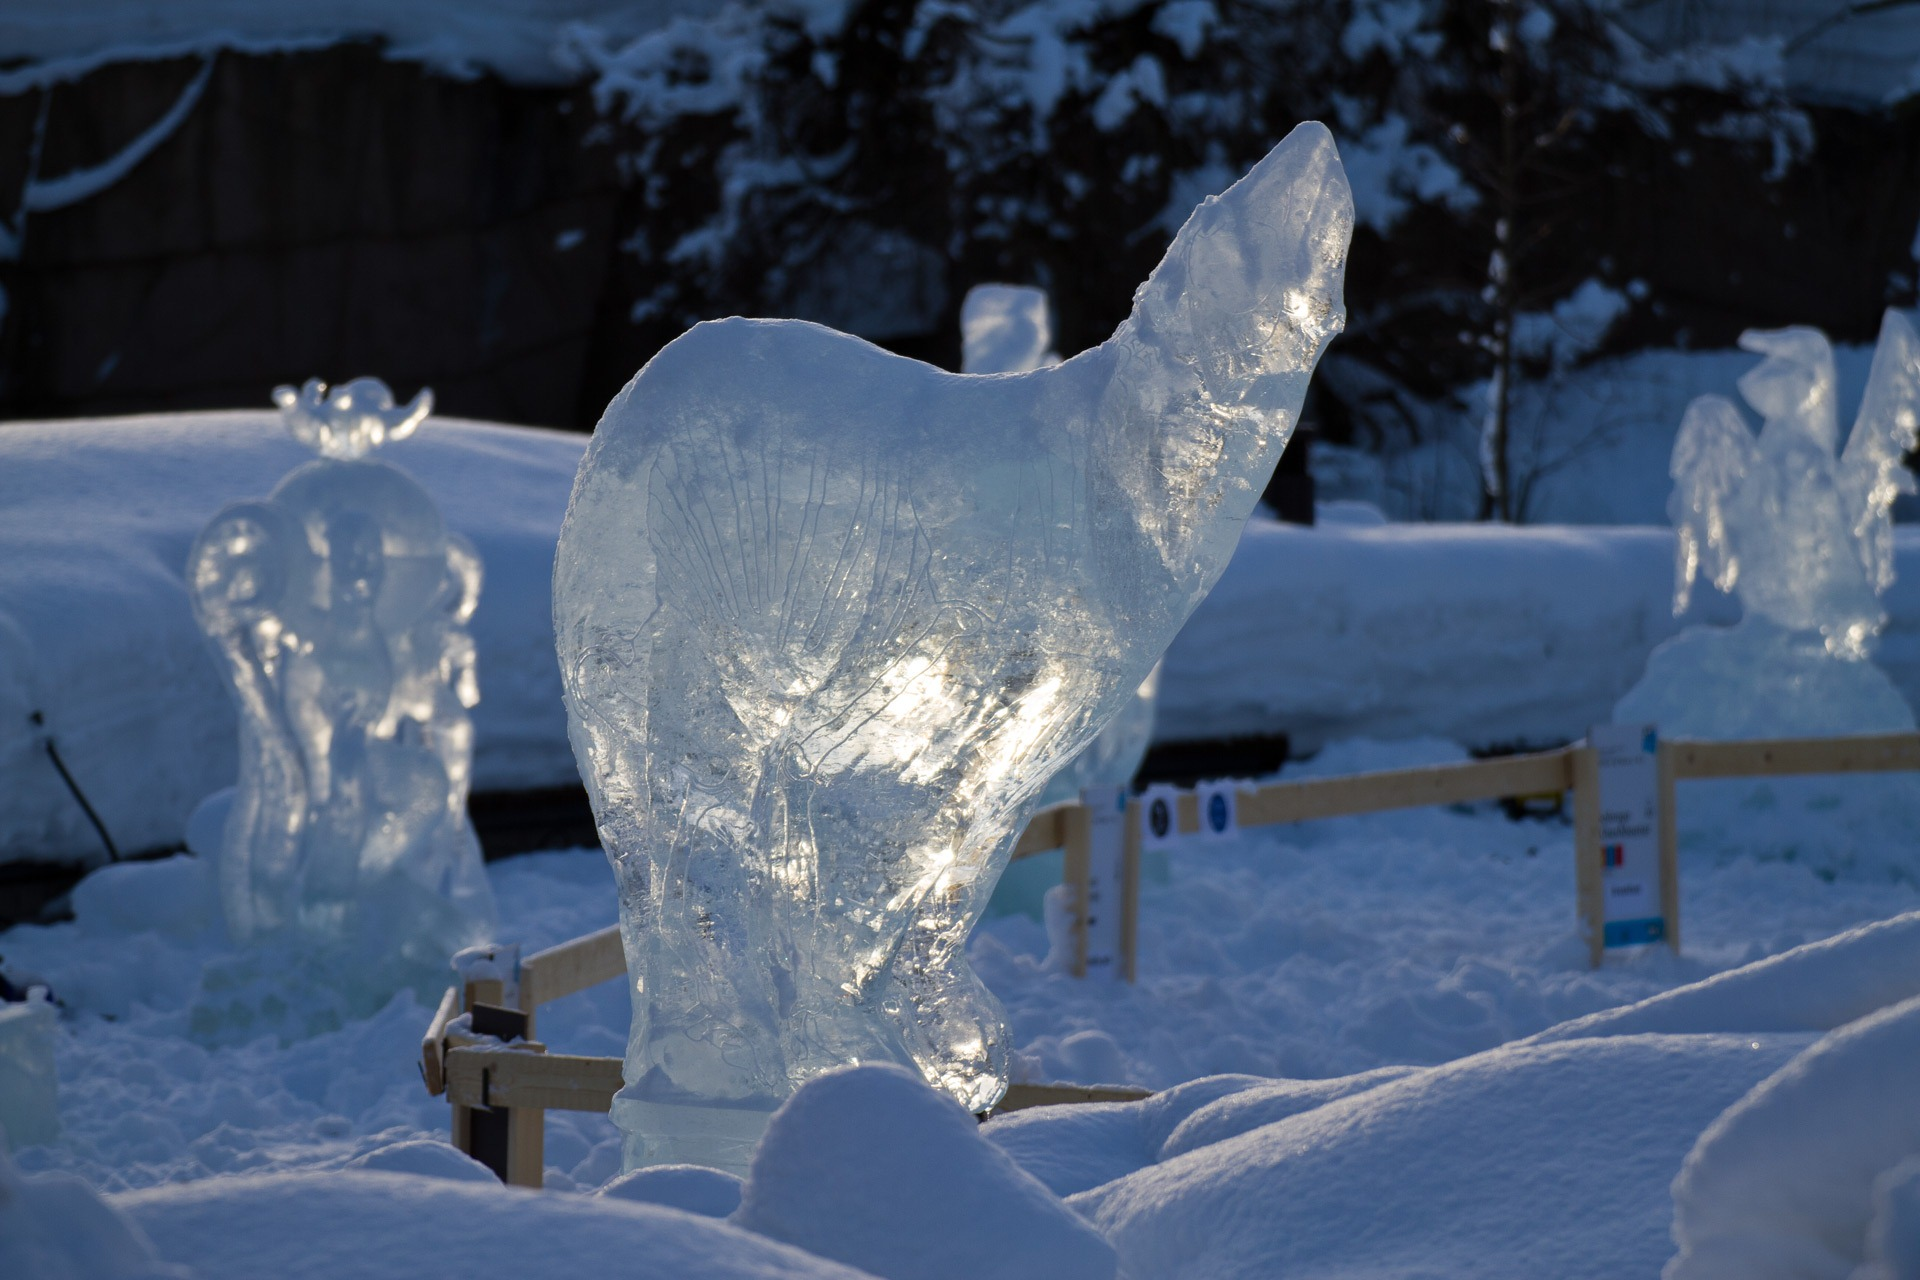 Ice sculptures | Photography blog by Sampsa Sulonen